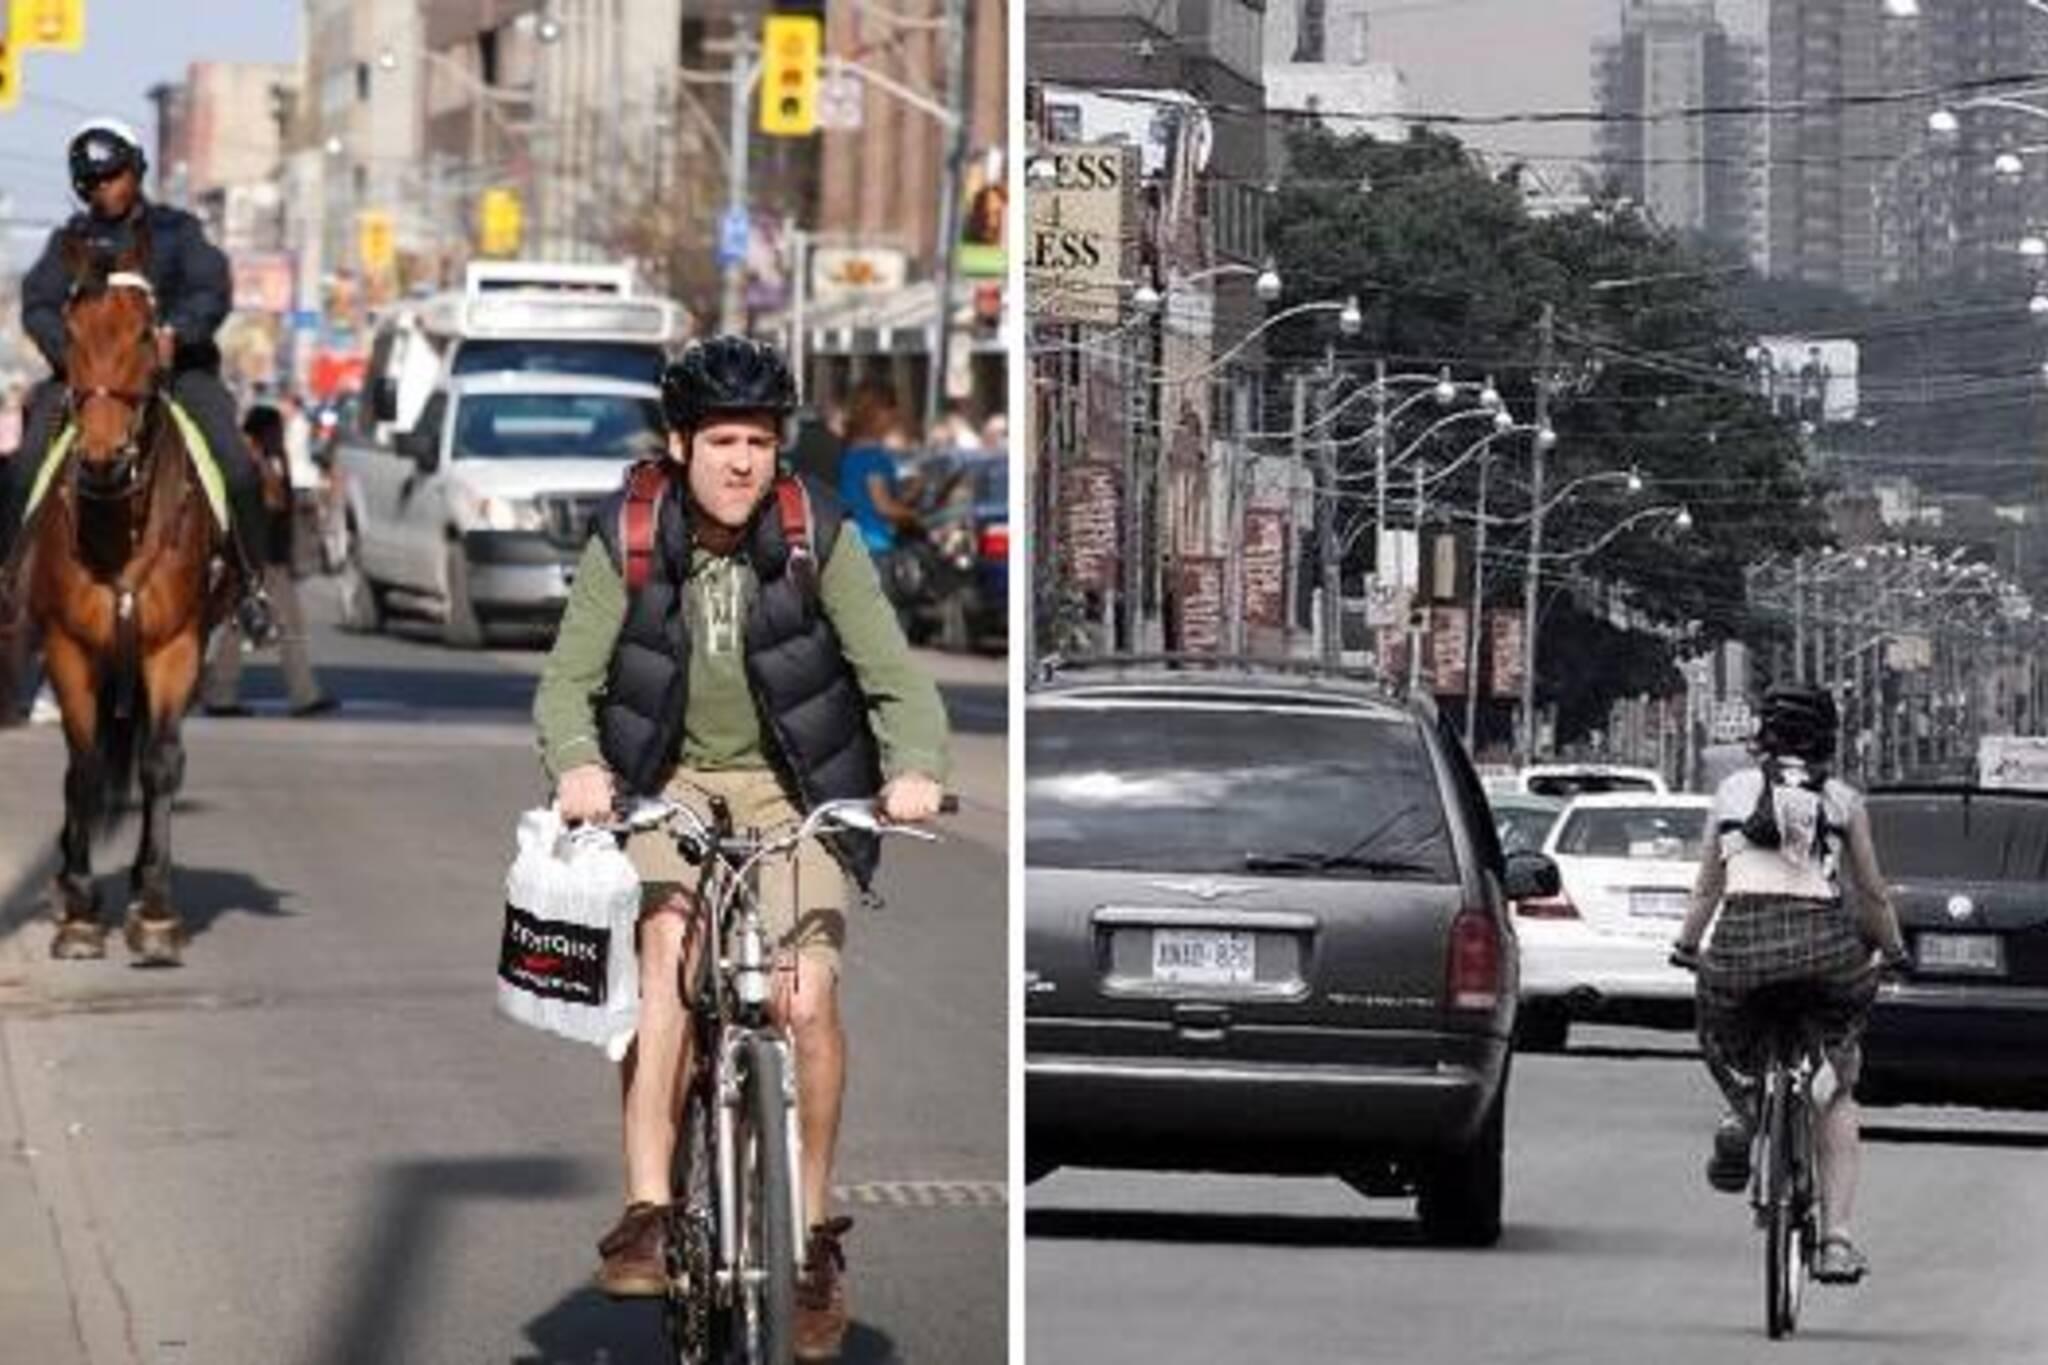 Biking in Toronto Traffic